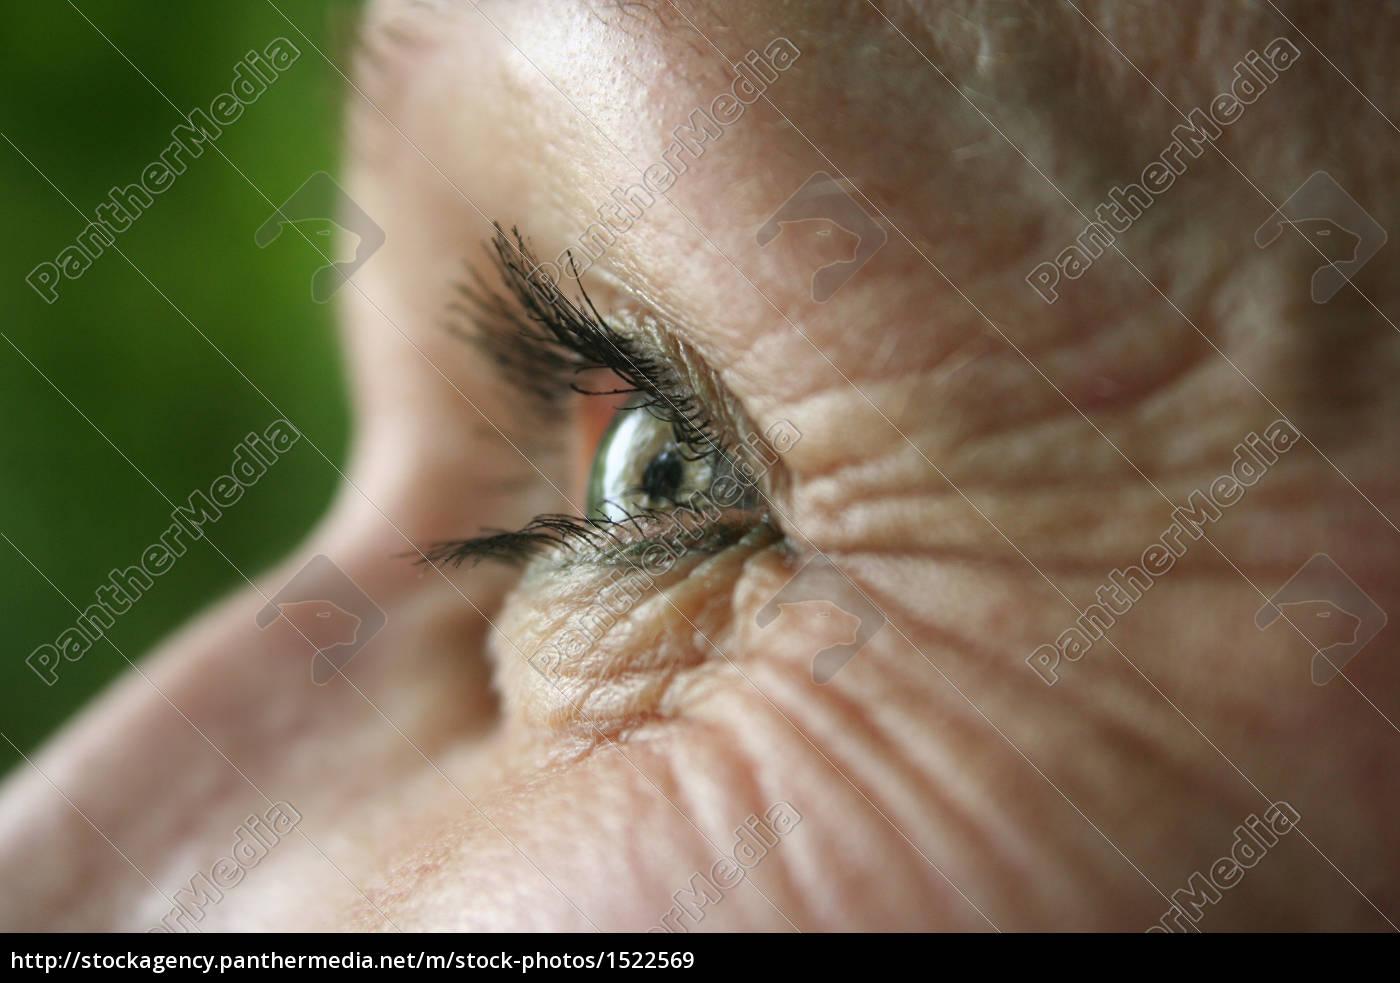 the, eye - 1522569